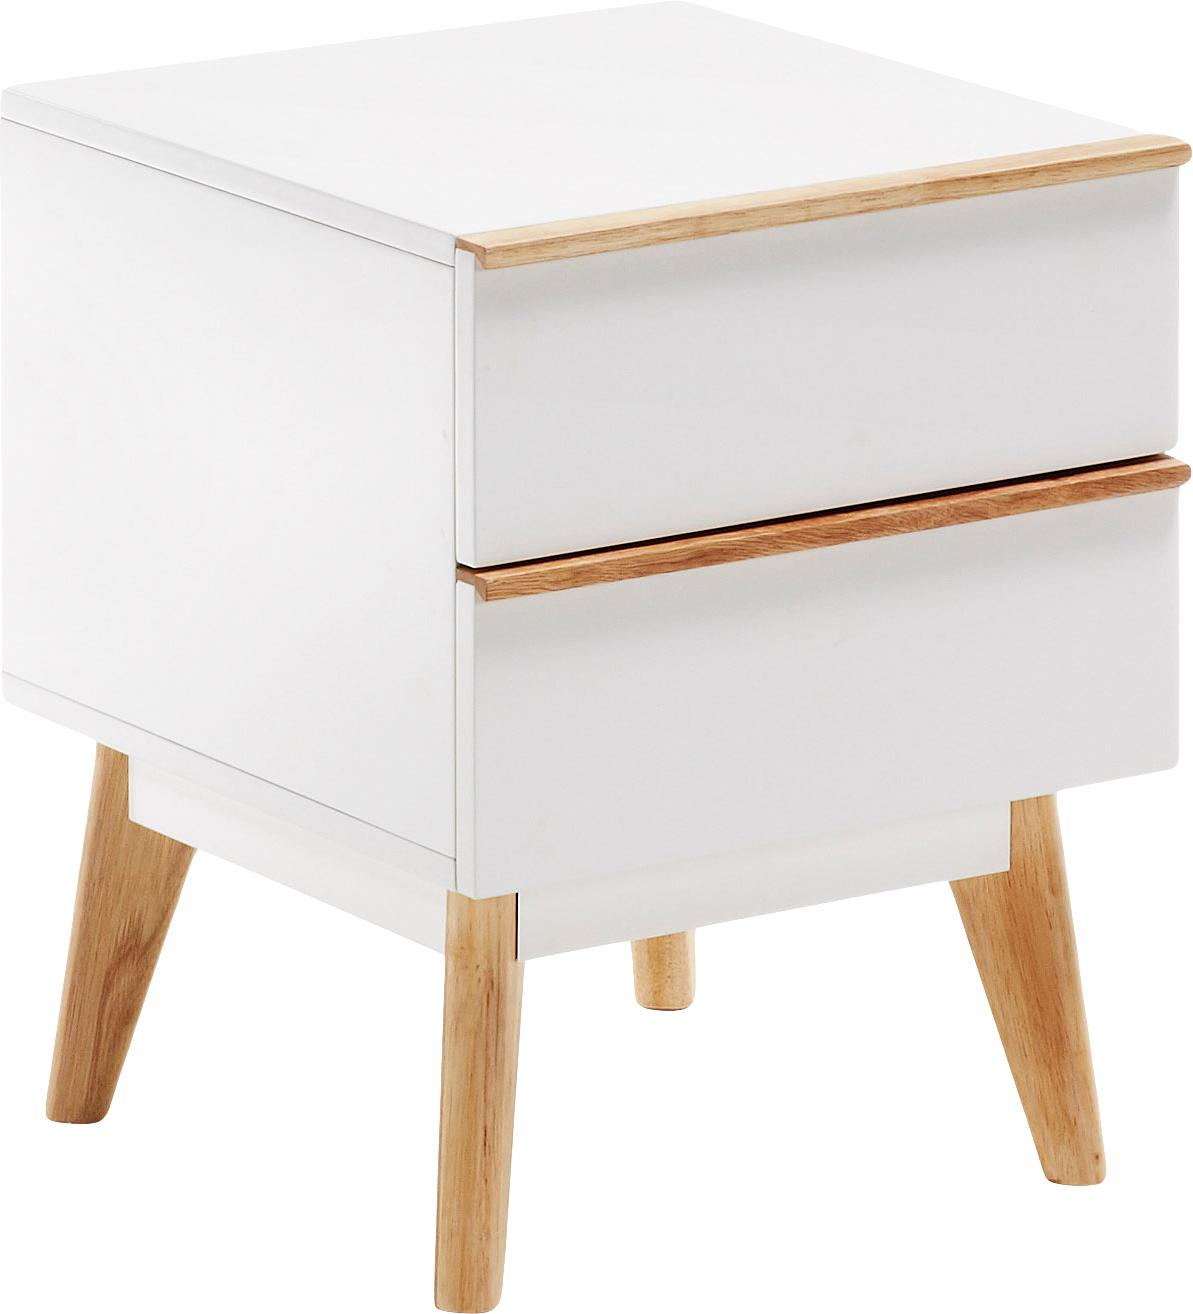 Comodino con cassetto Melan, Bianco, legno di quercia, Larg. 40 x Alt. 50 cm